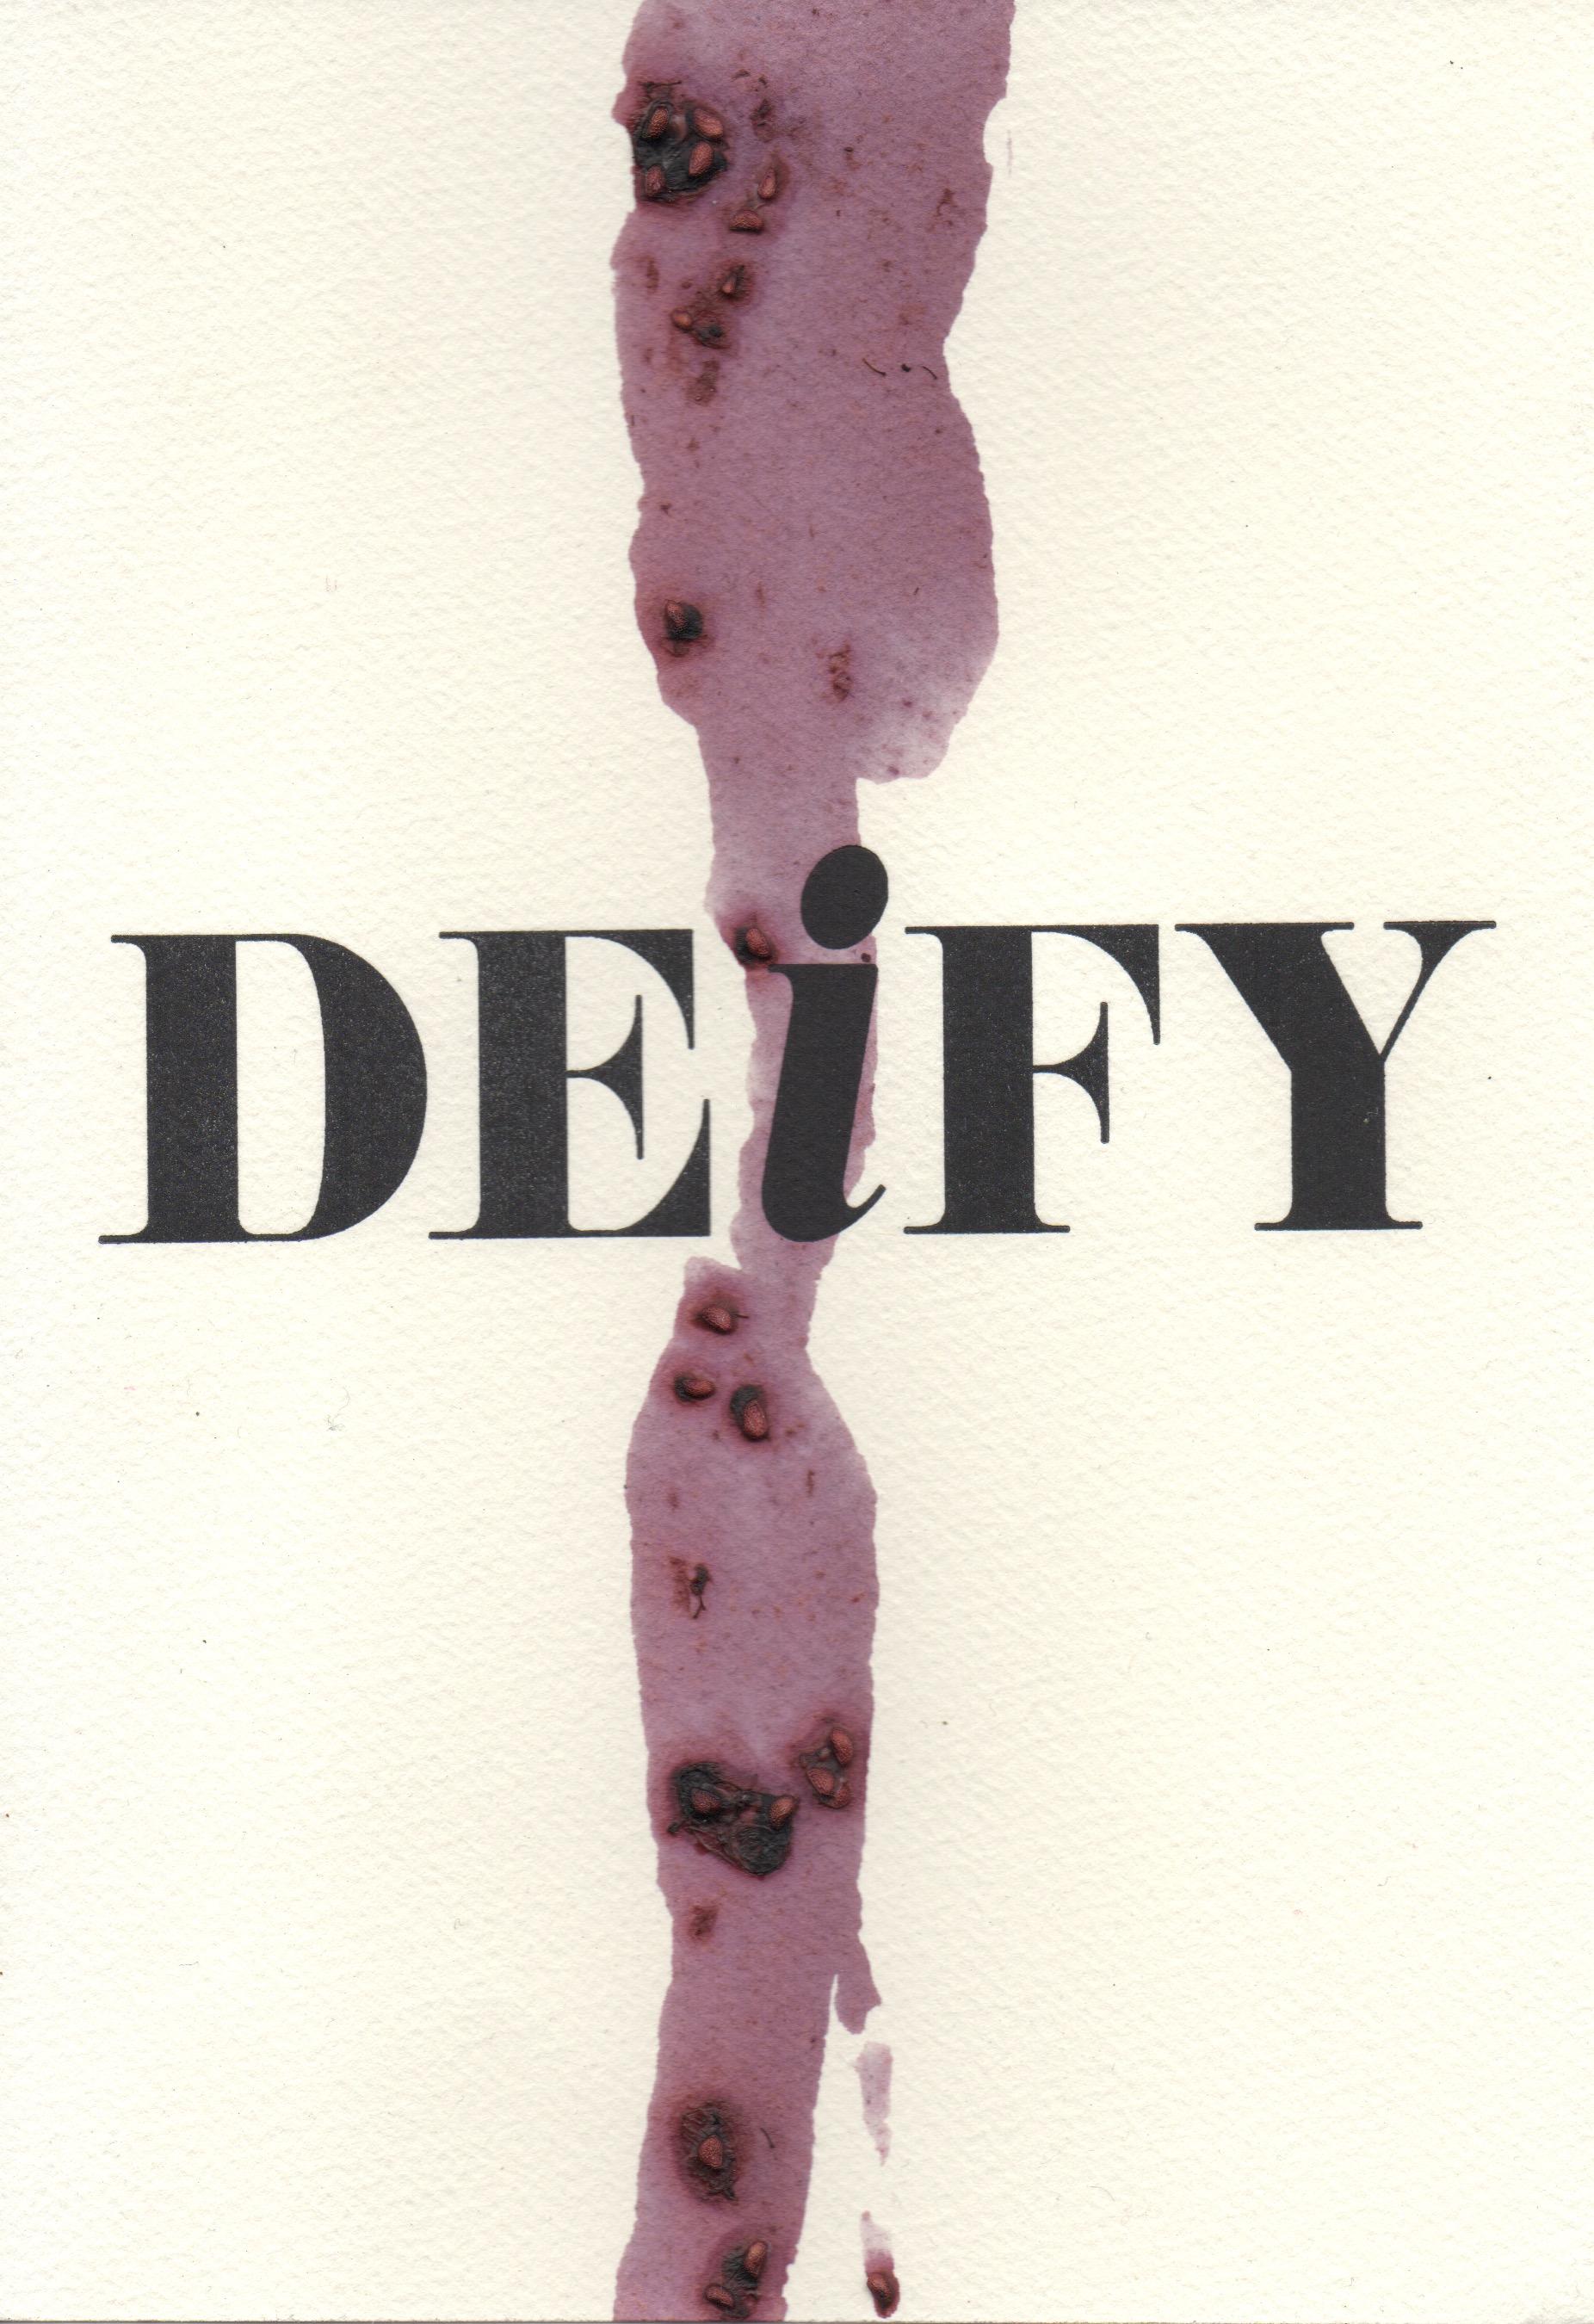 Deify_02.jpeg